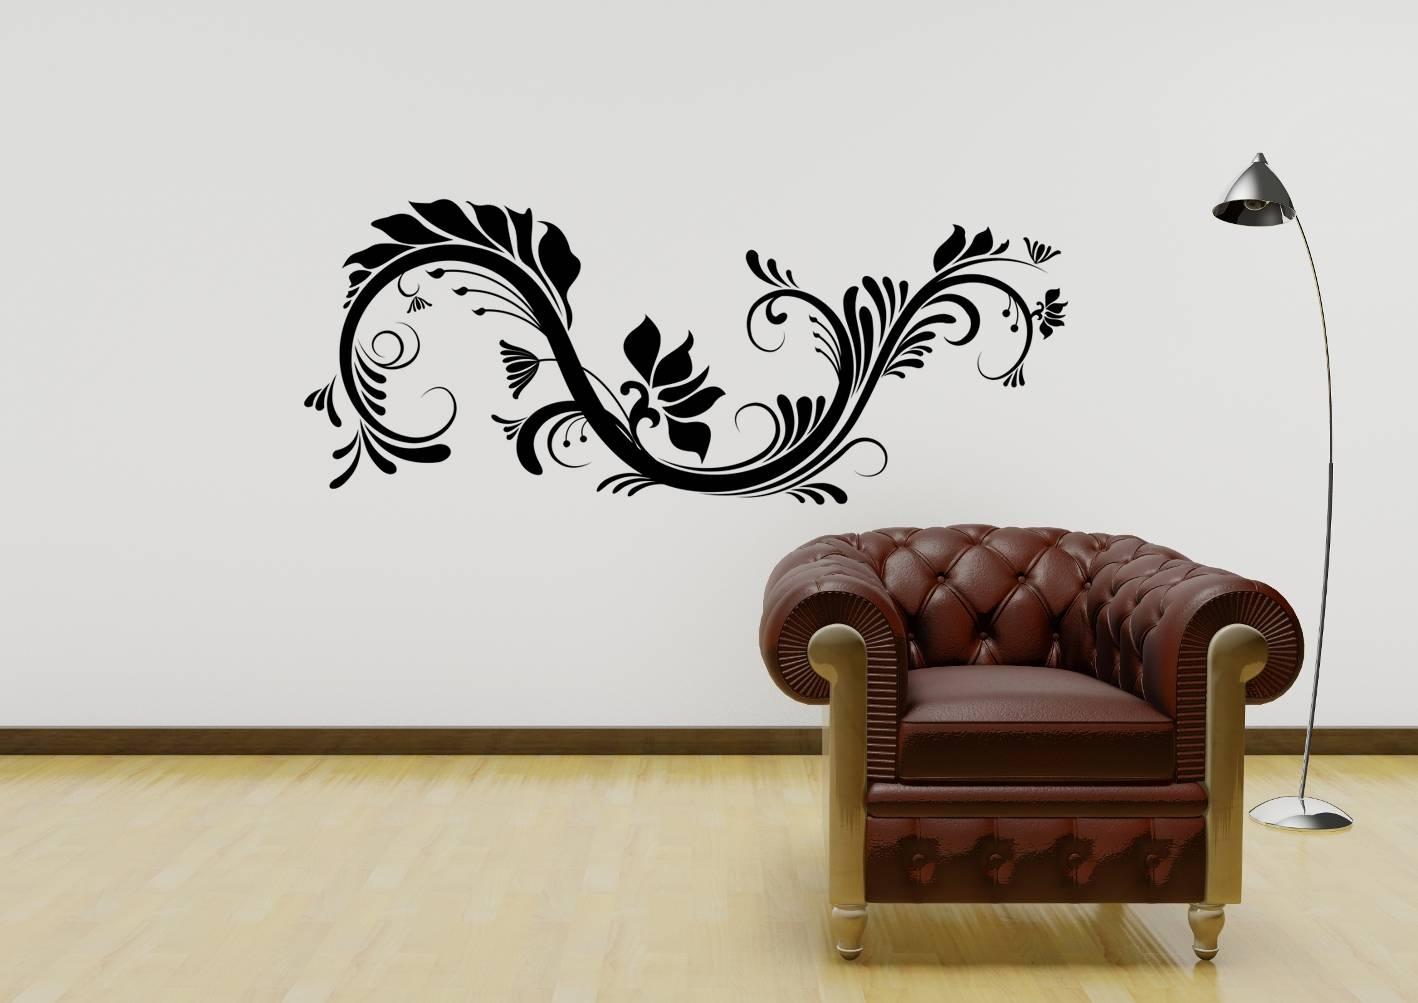 Vinyl Wall Art Glamorous Wall Art Design – Home Design Ideas Inside 2017 Glamorous Wall Art (View 23 of 30)